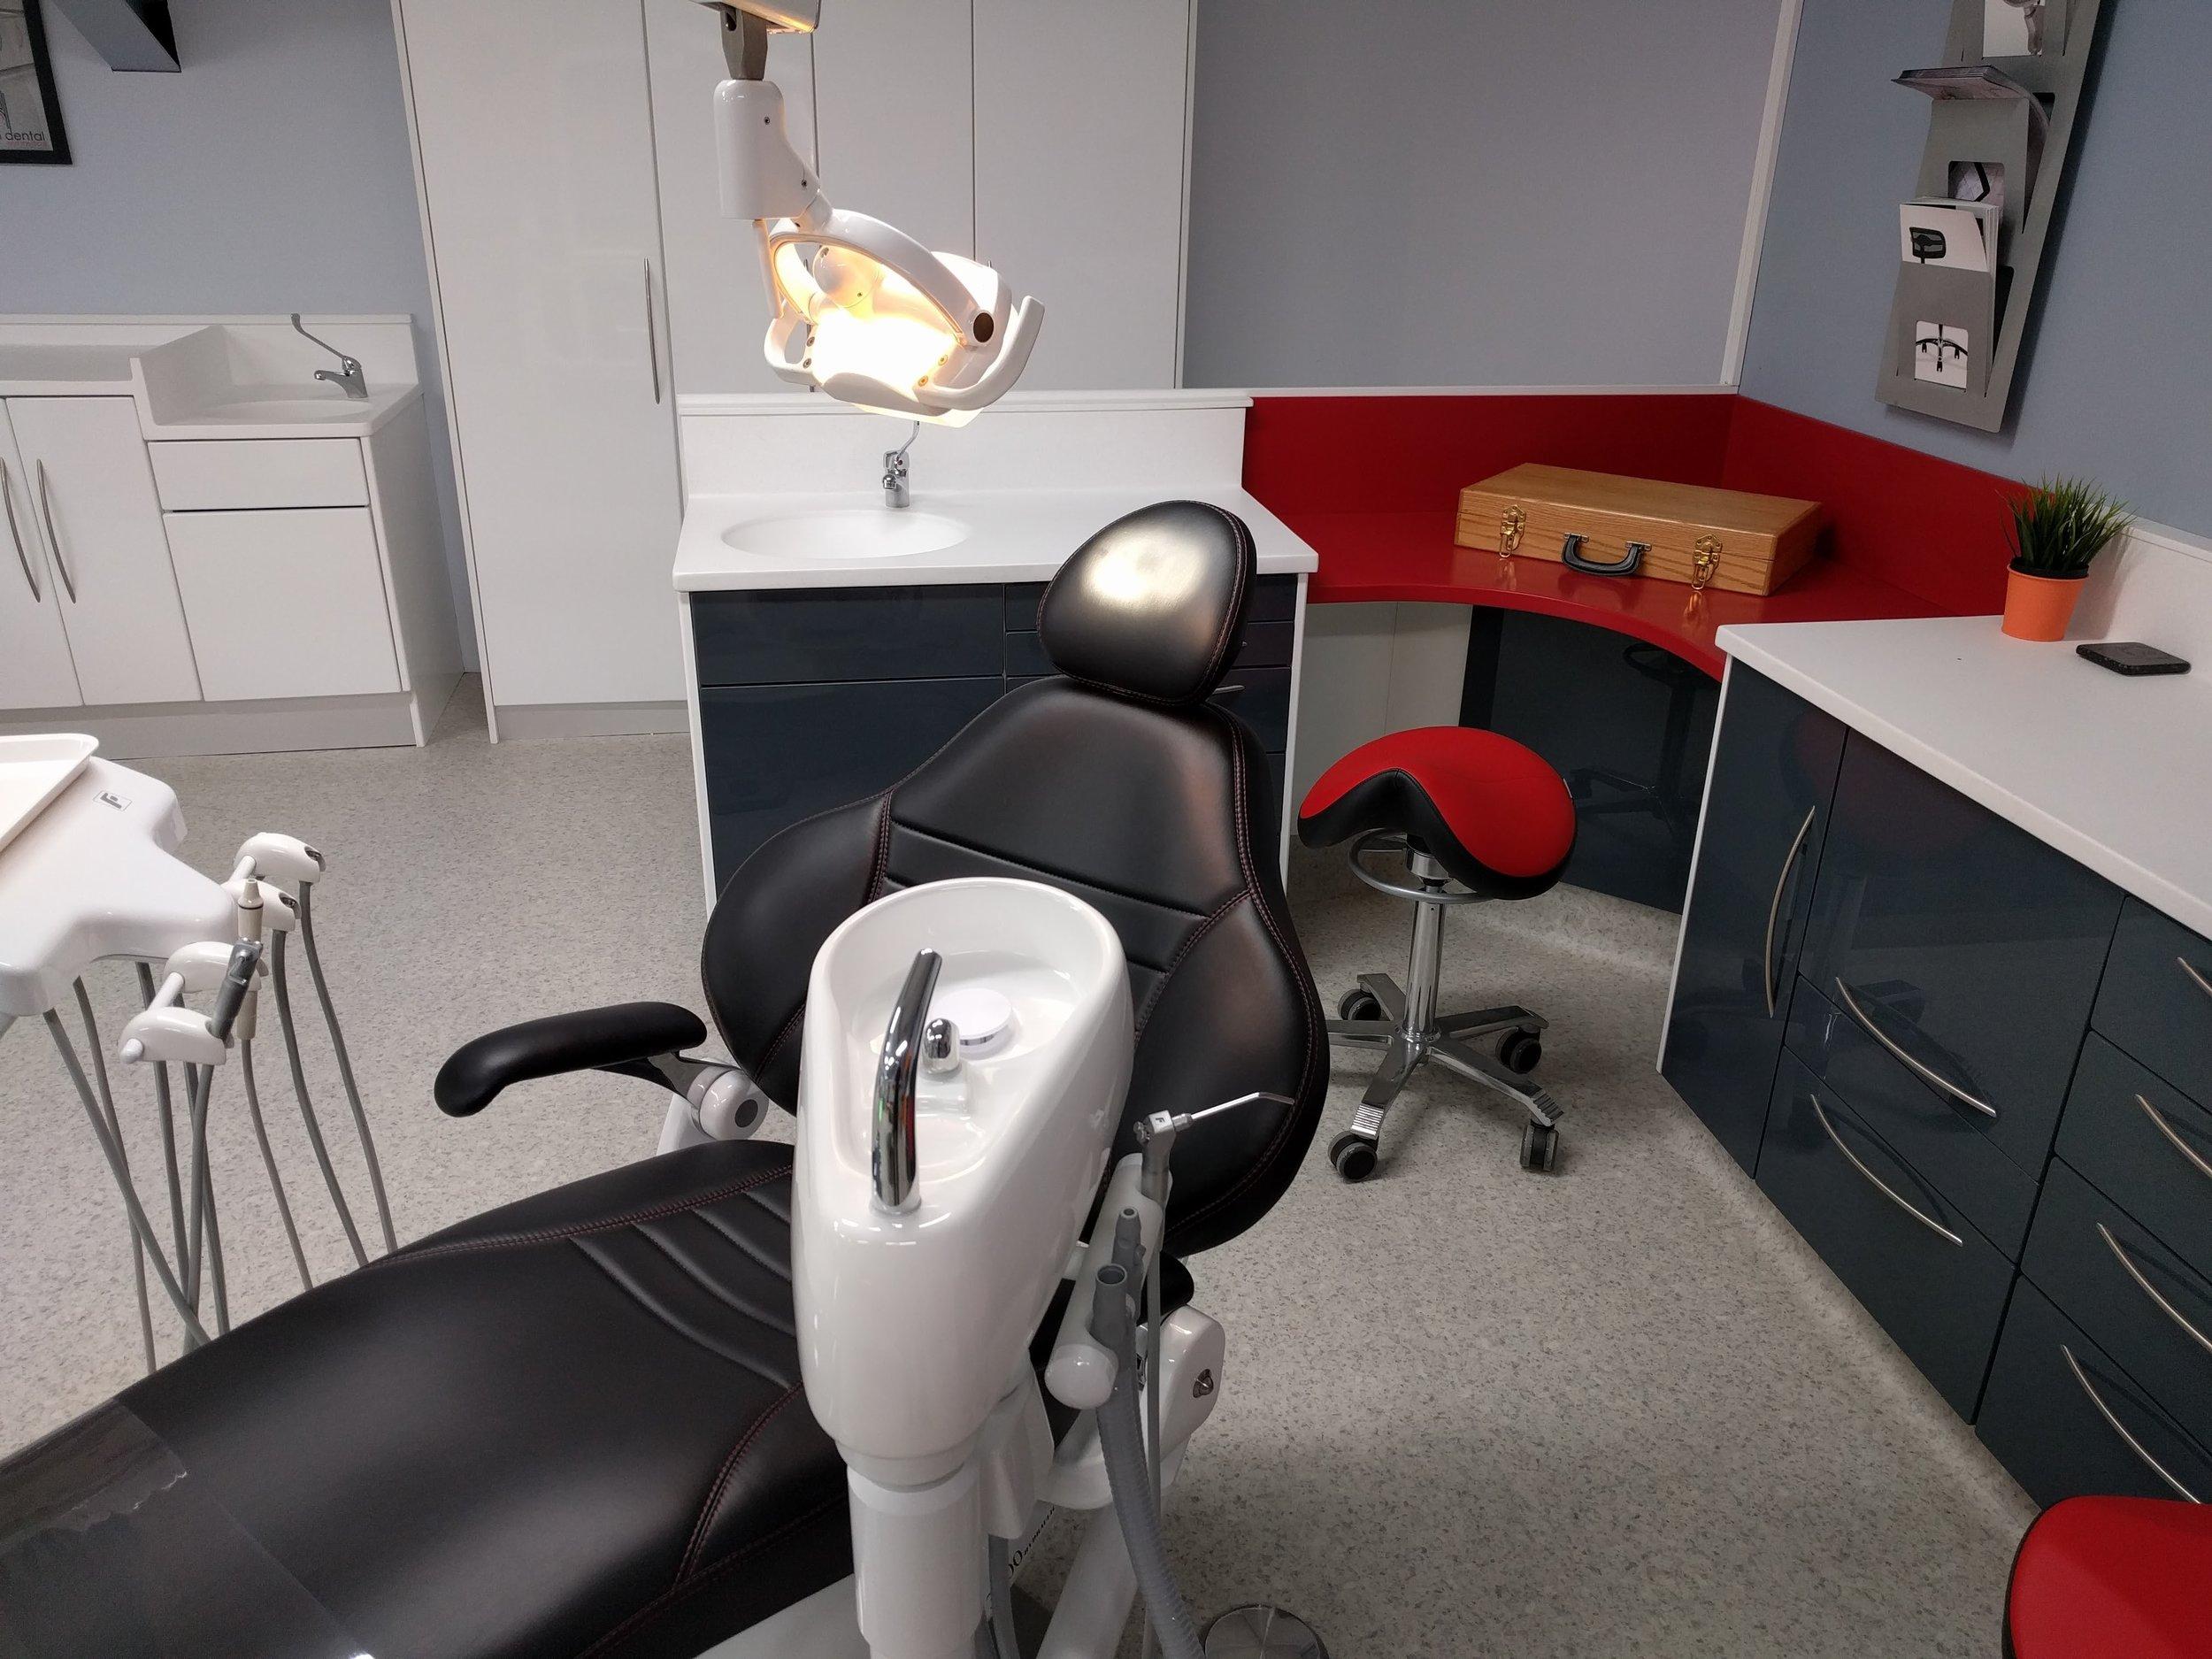 red room 7.jpg